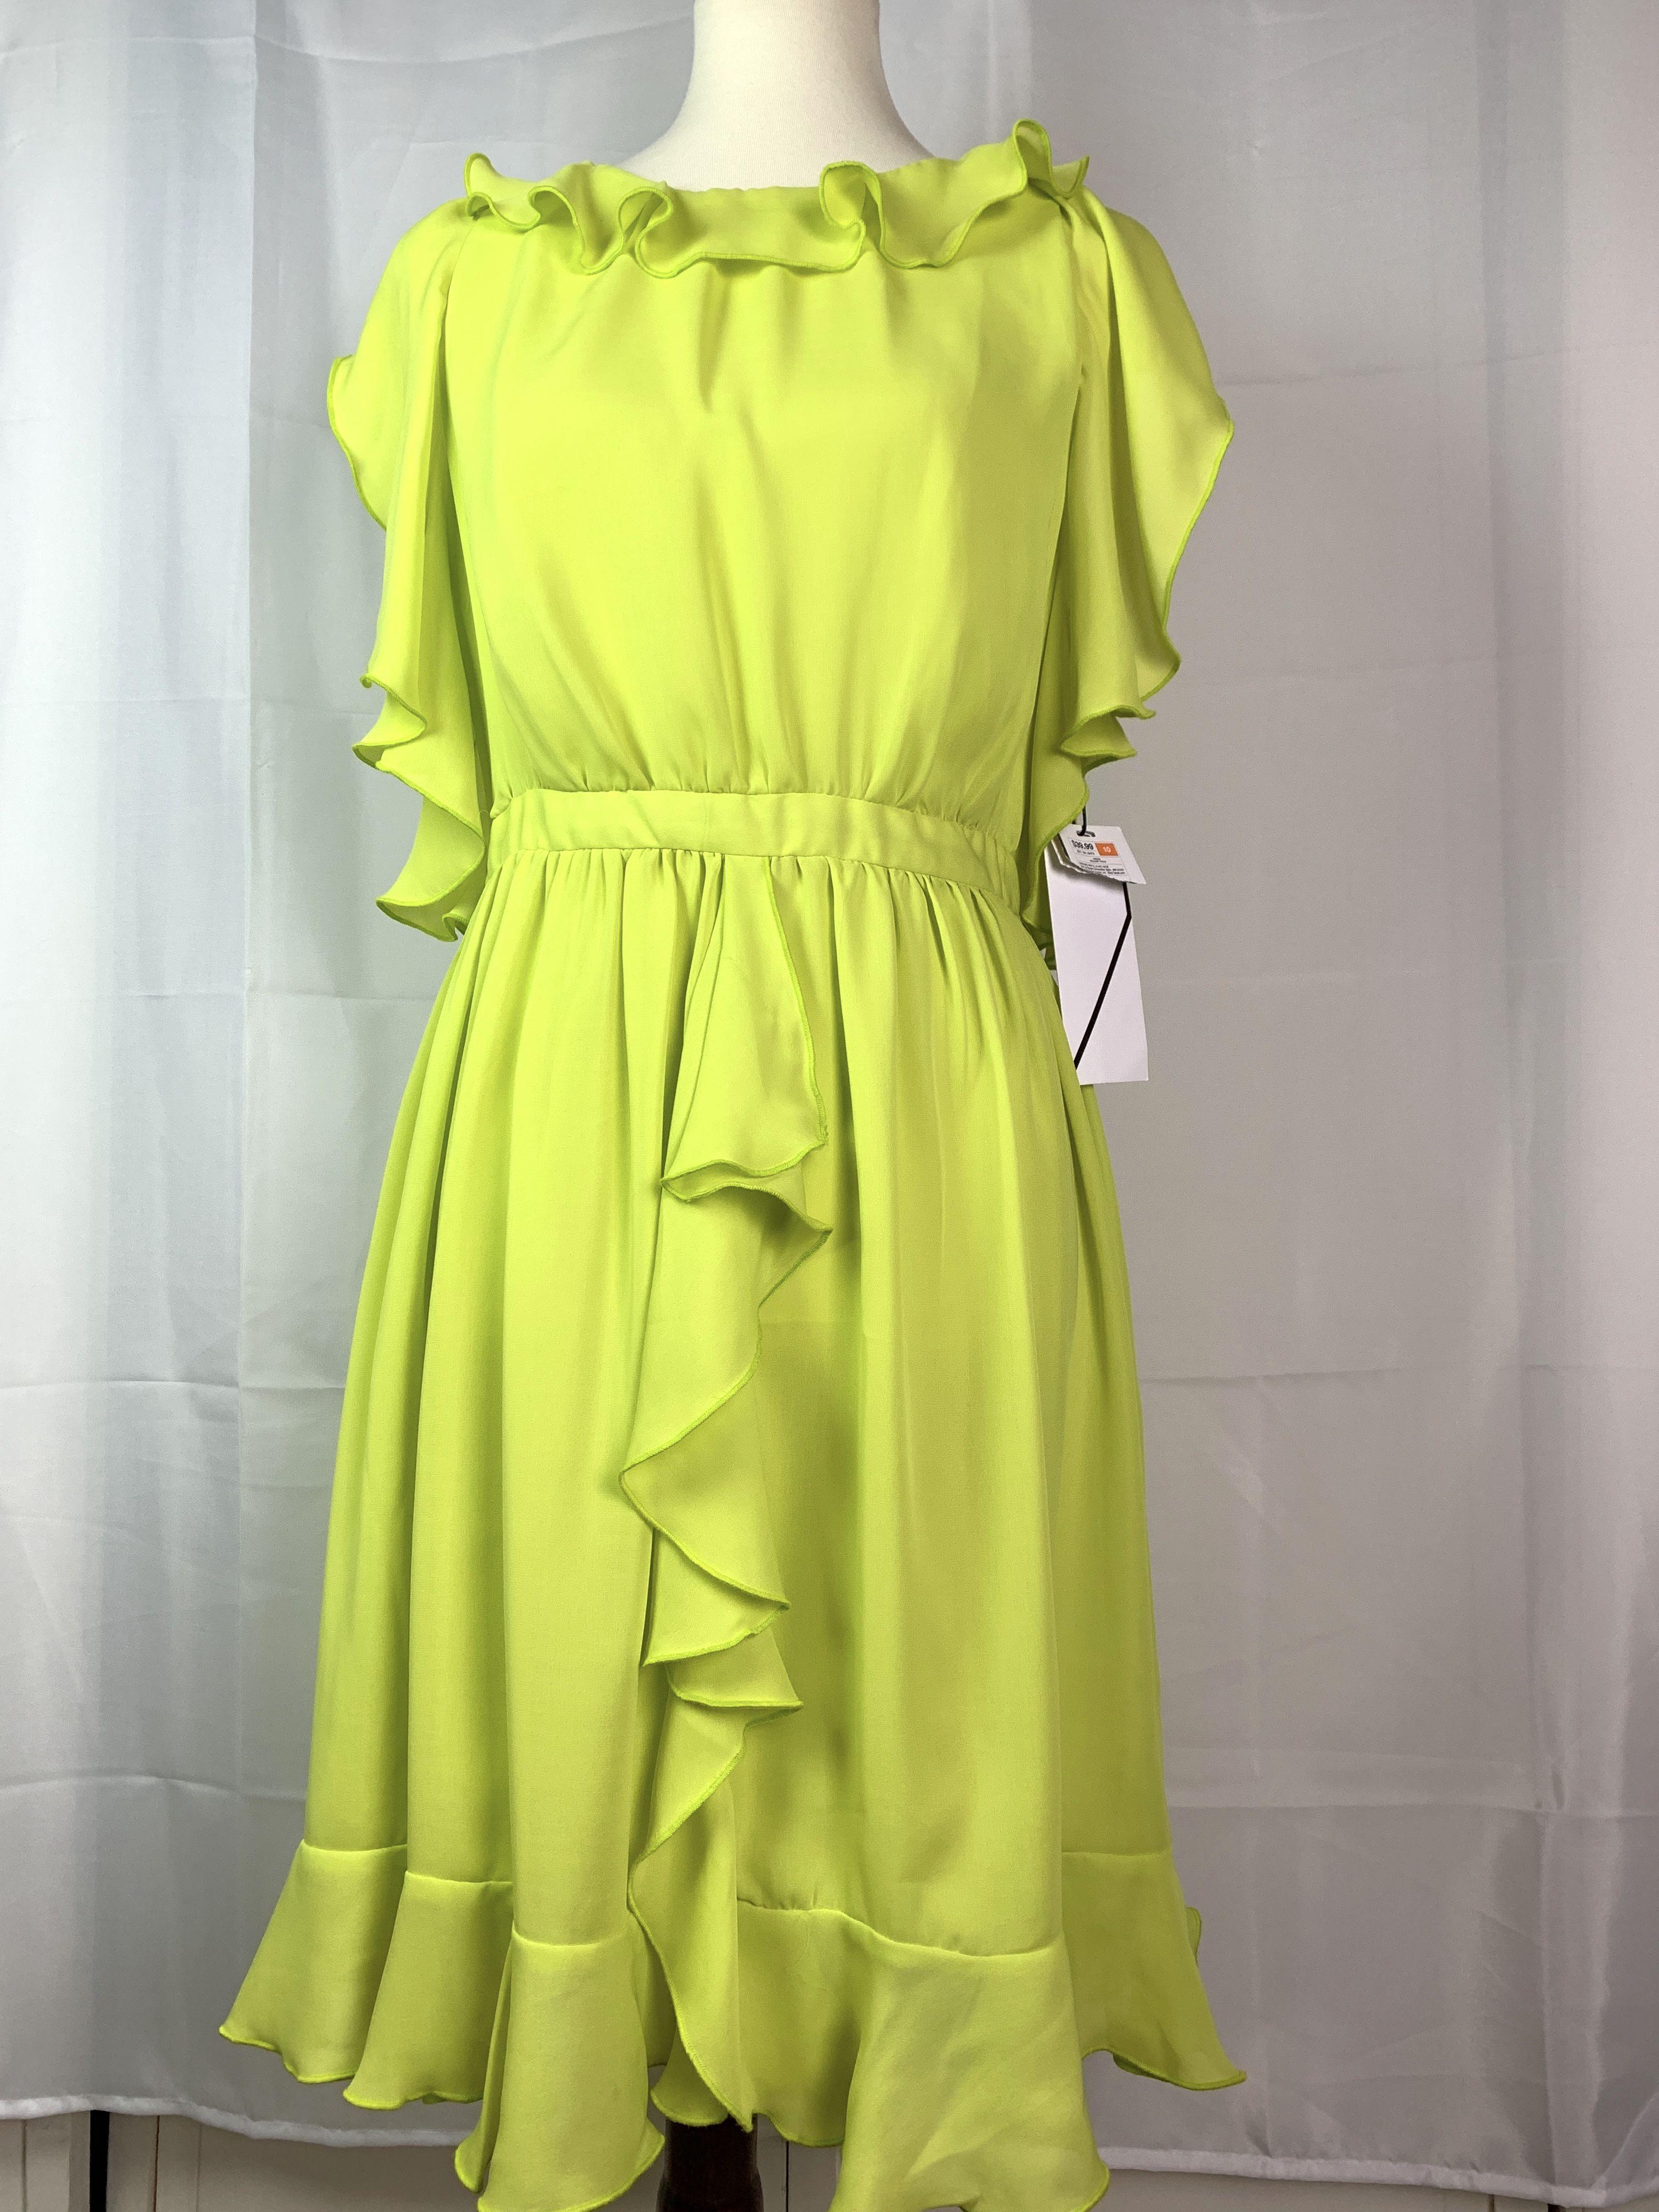 Prabal Gurung Dress Size 10 Neon Green Yellow Ruffle Sleeveless Target Designer Yellow Knee Length Dress Target Clothes Prabal Gurung Dress [ 4032 x 3024 Pixel ]